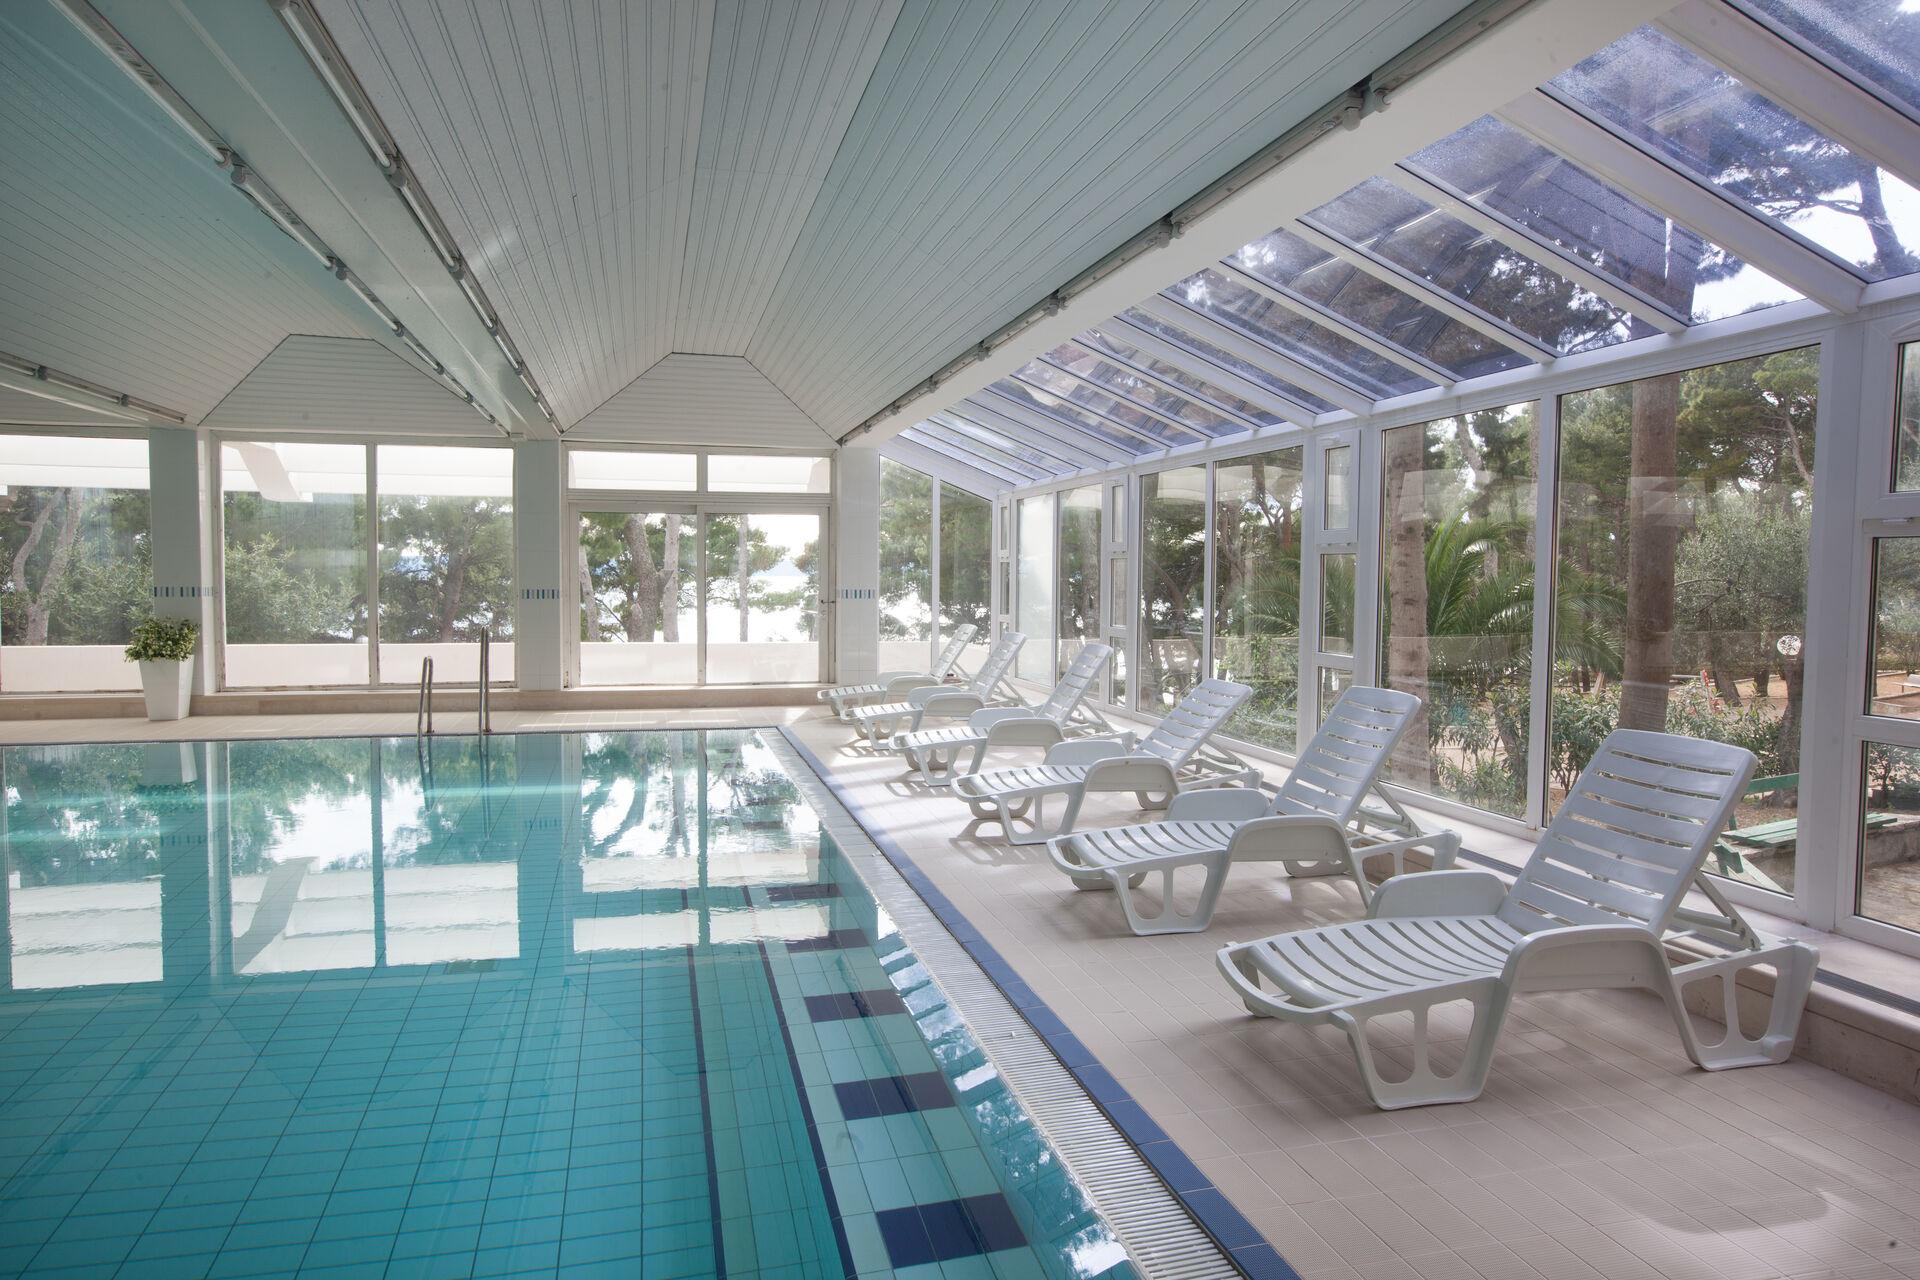 https://cms.satur.sk/data/imgs/tour_image/orig/10-swimming-pool-1938255.jpg